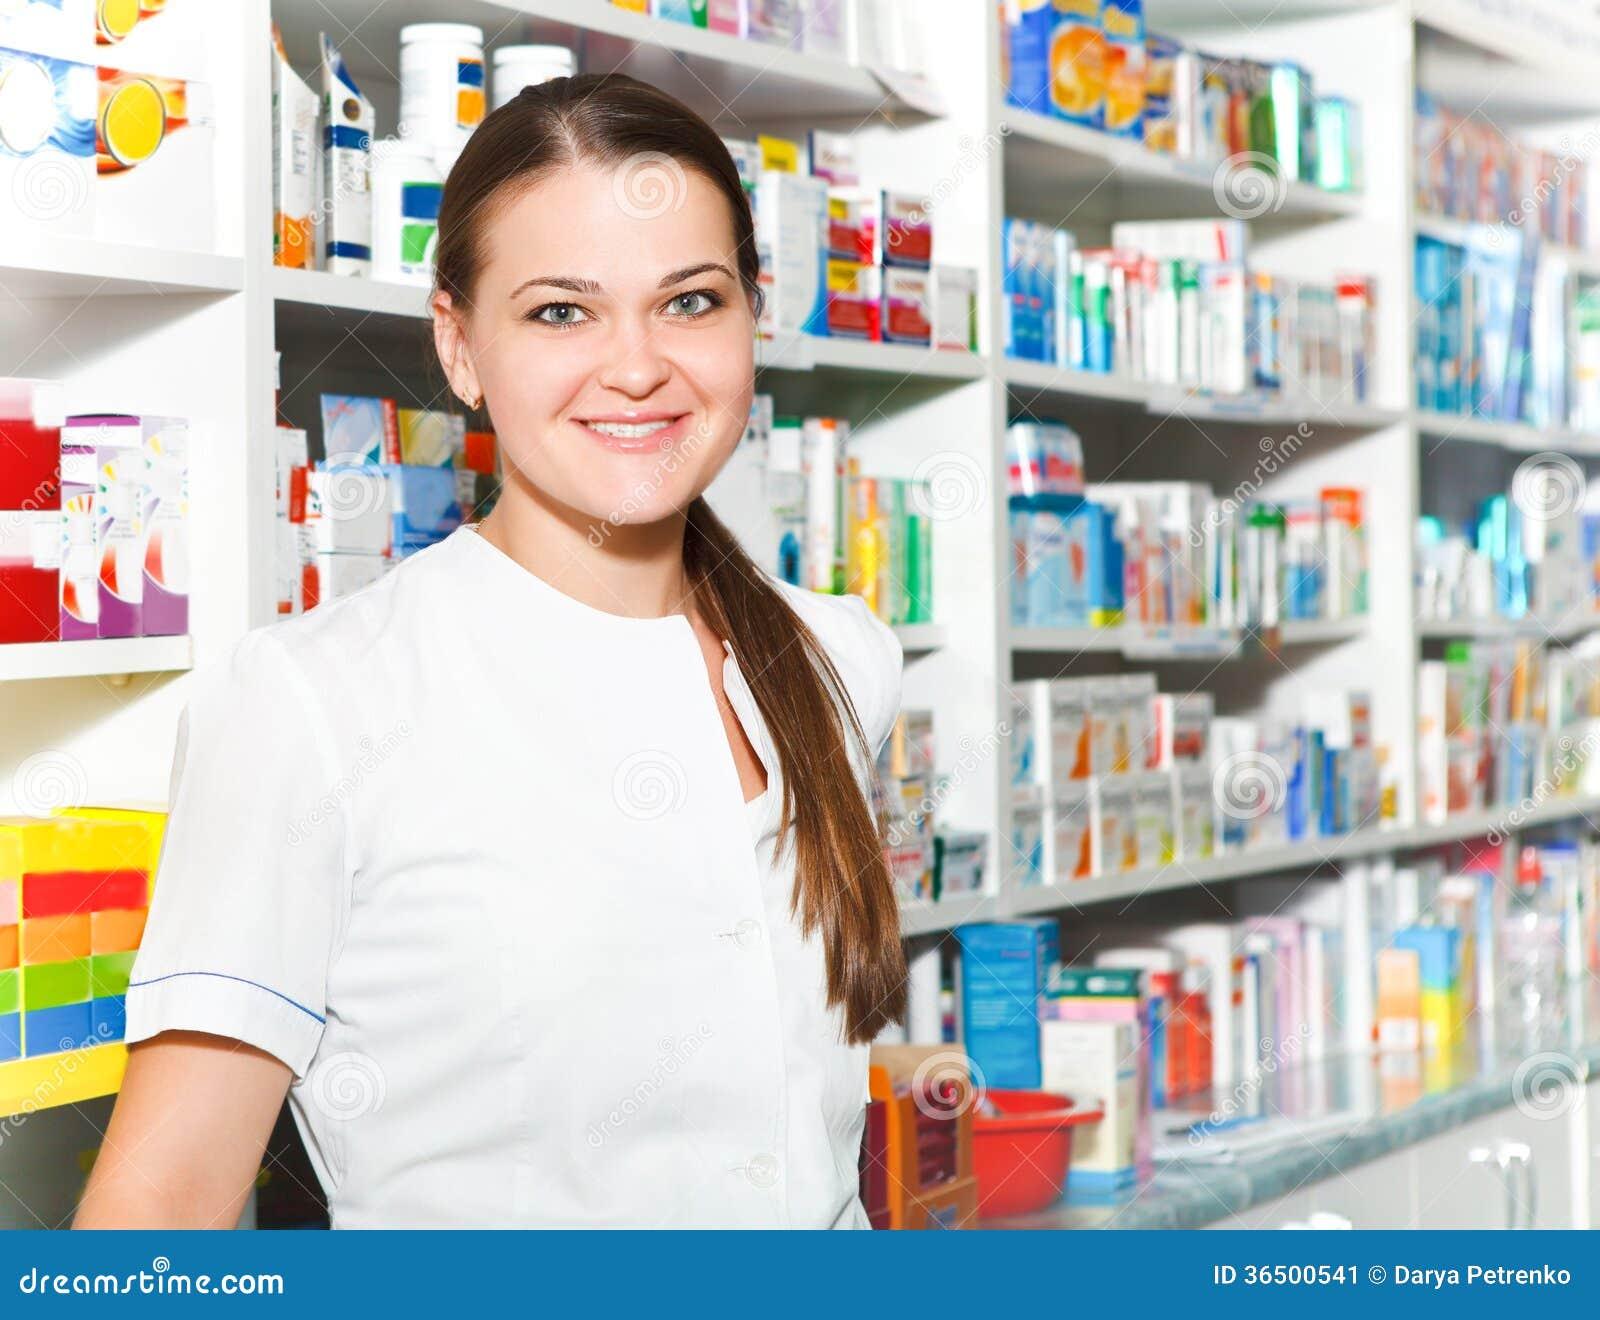 Portrait de pharmacien féminin